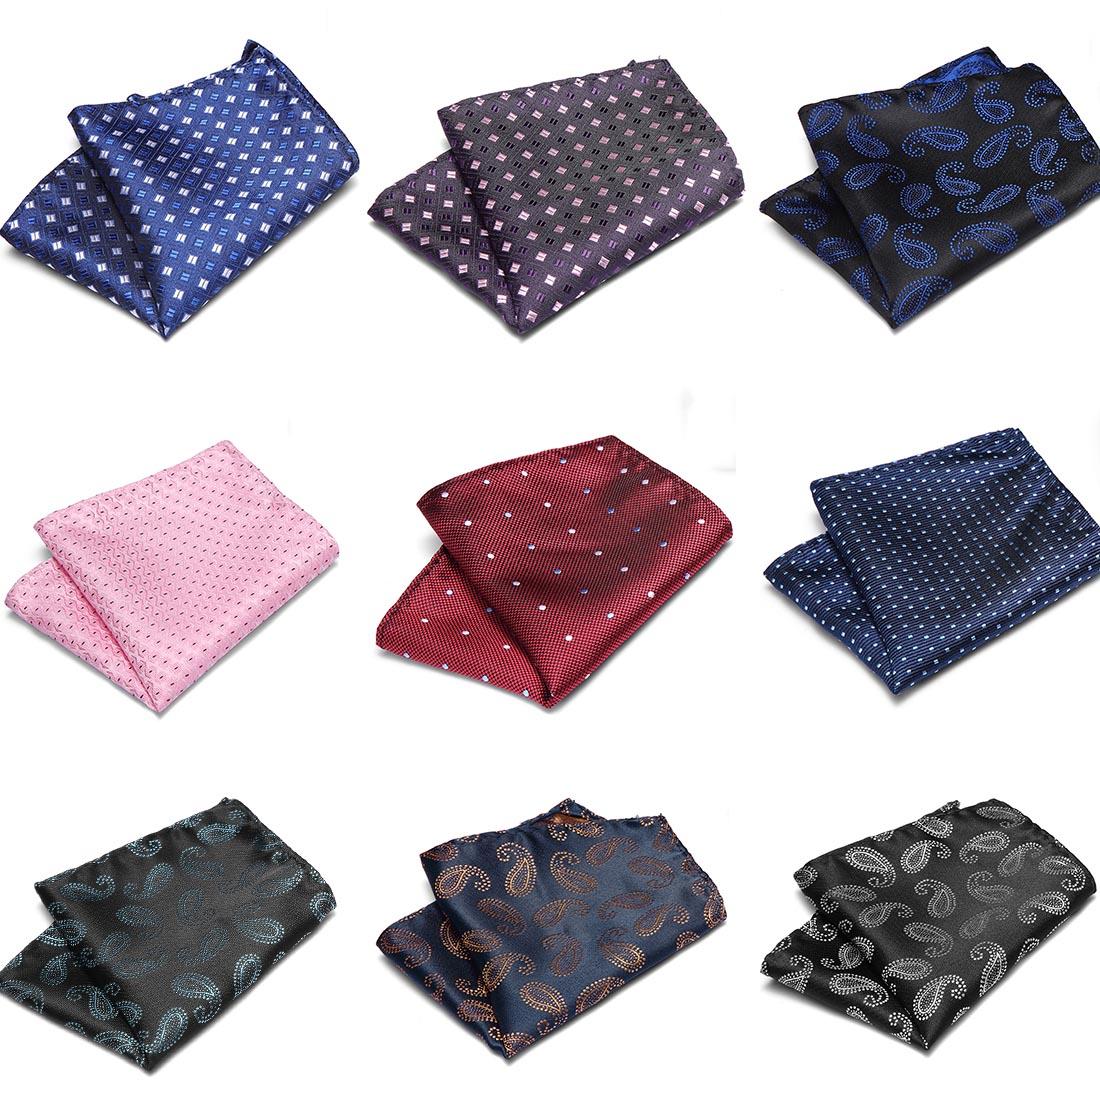 22x22cm   Hankerchief Pocket Squares  Luxury Mens Silk Touch Soft Hankies